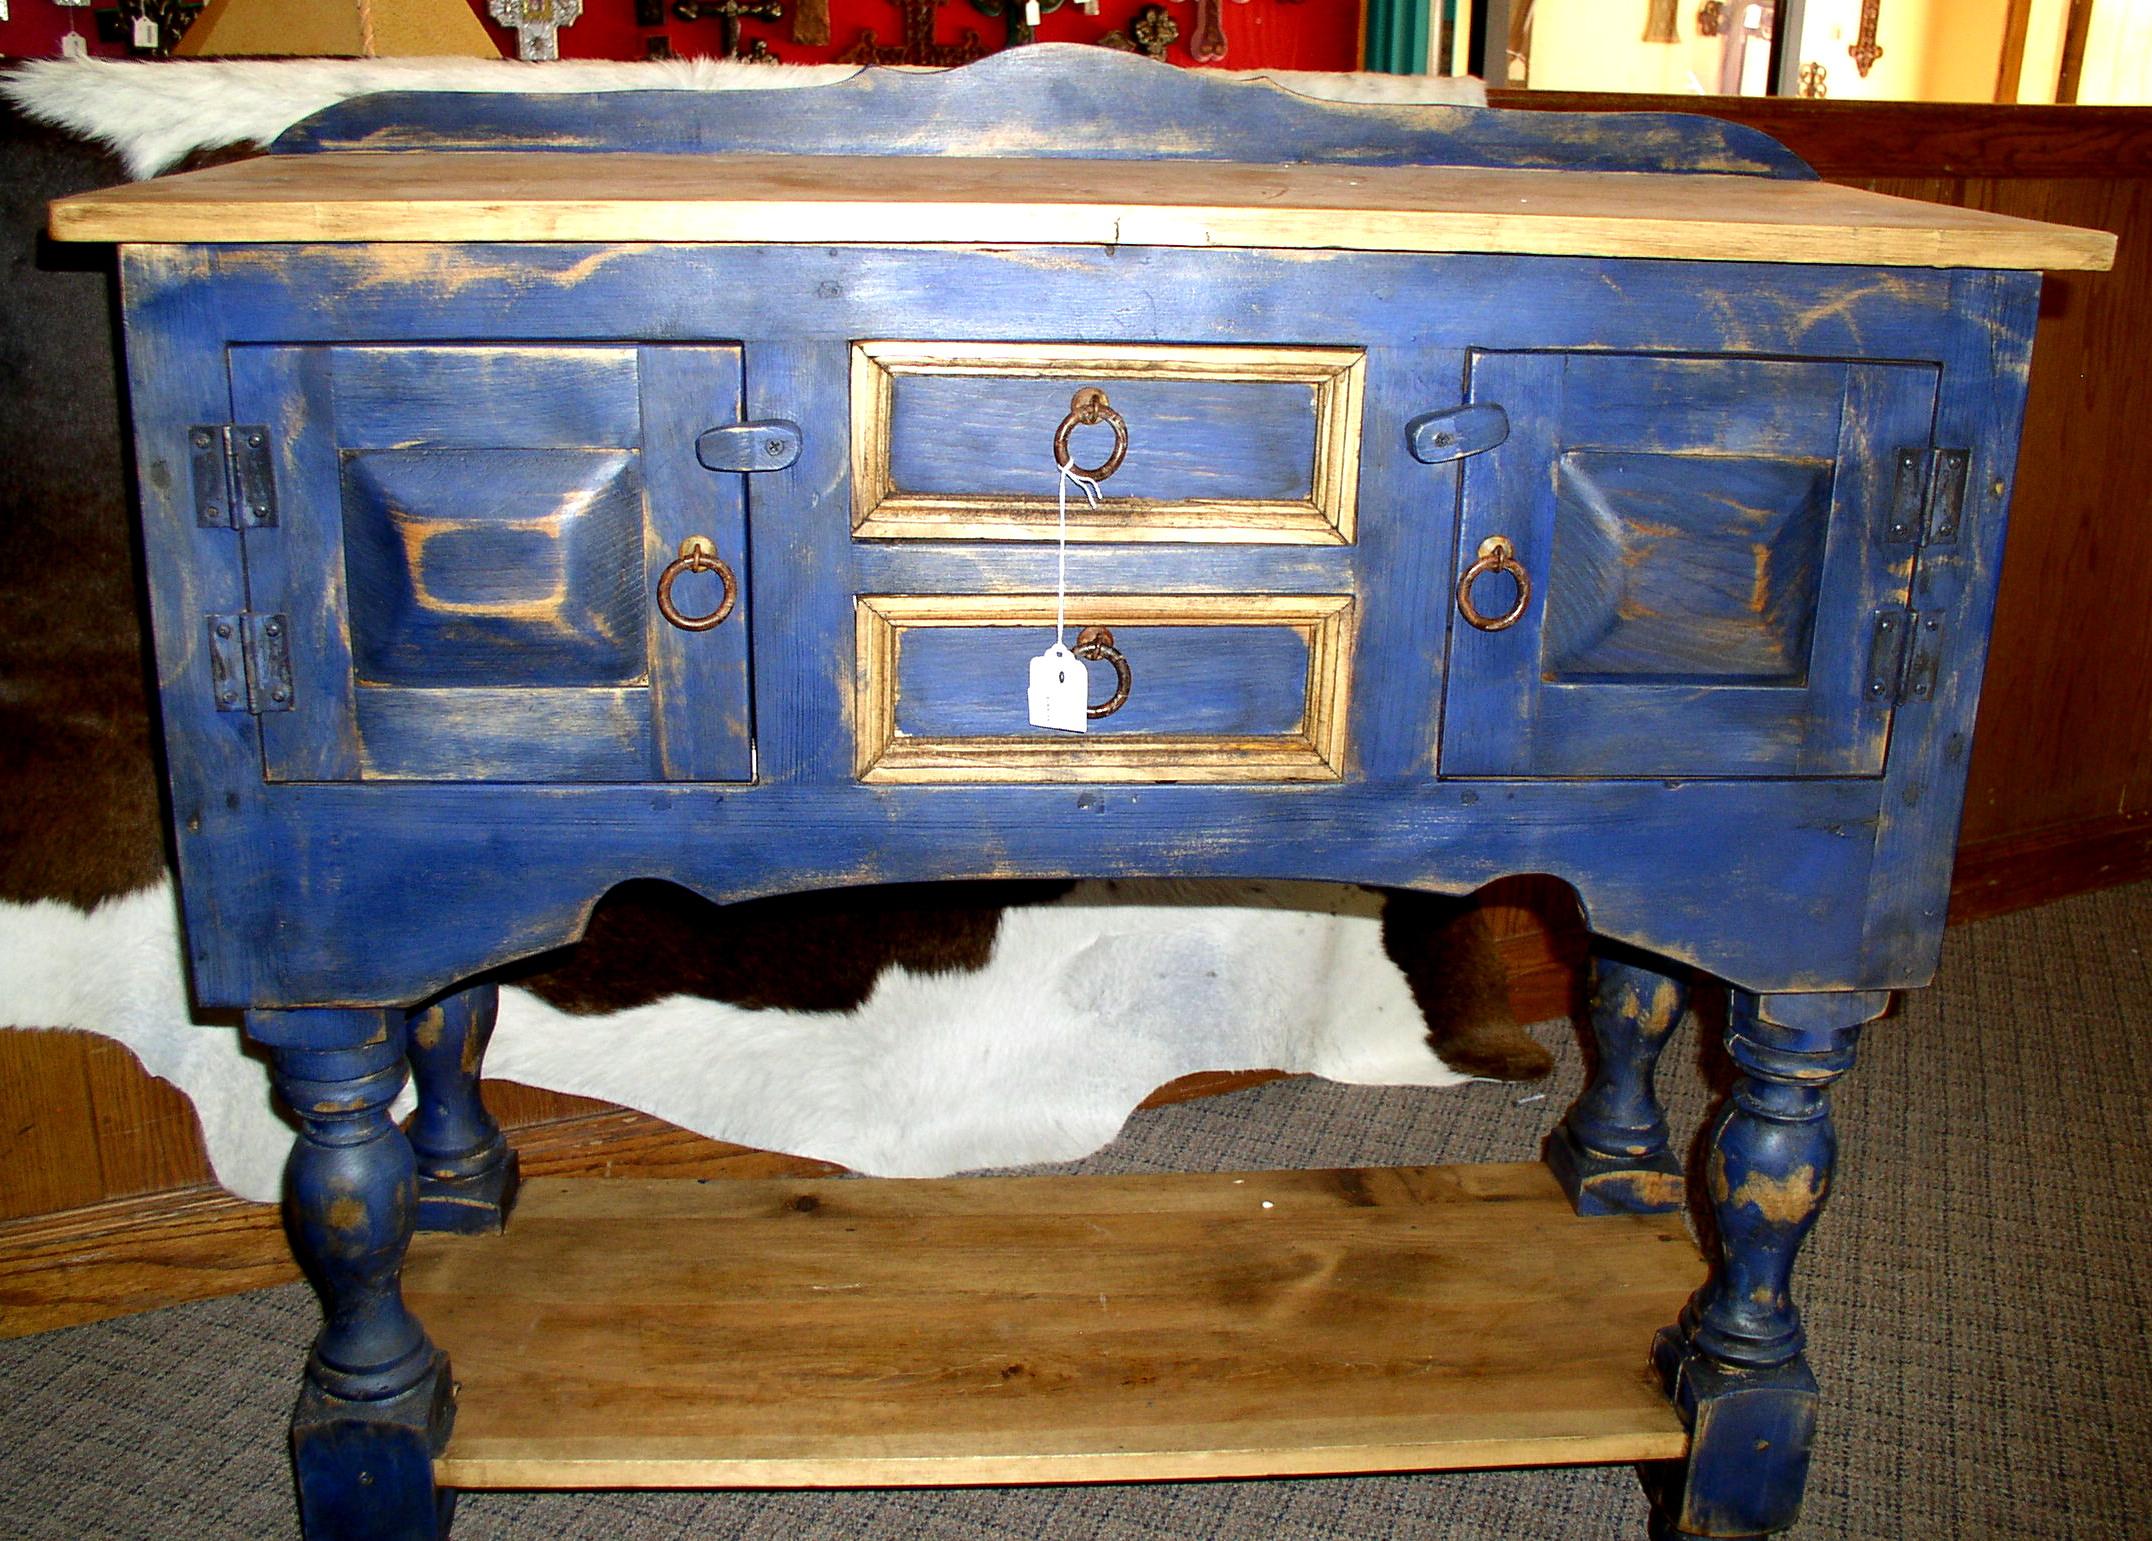 turnleg chihuahua buffet-blue.JPG